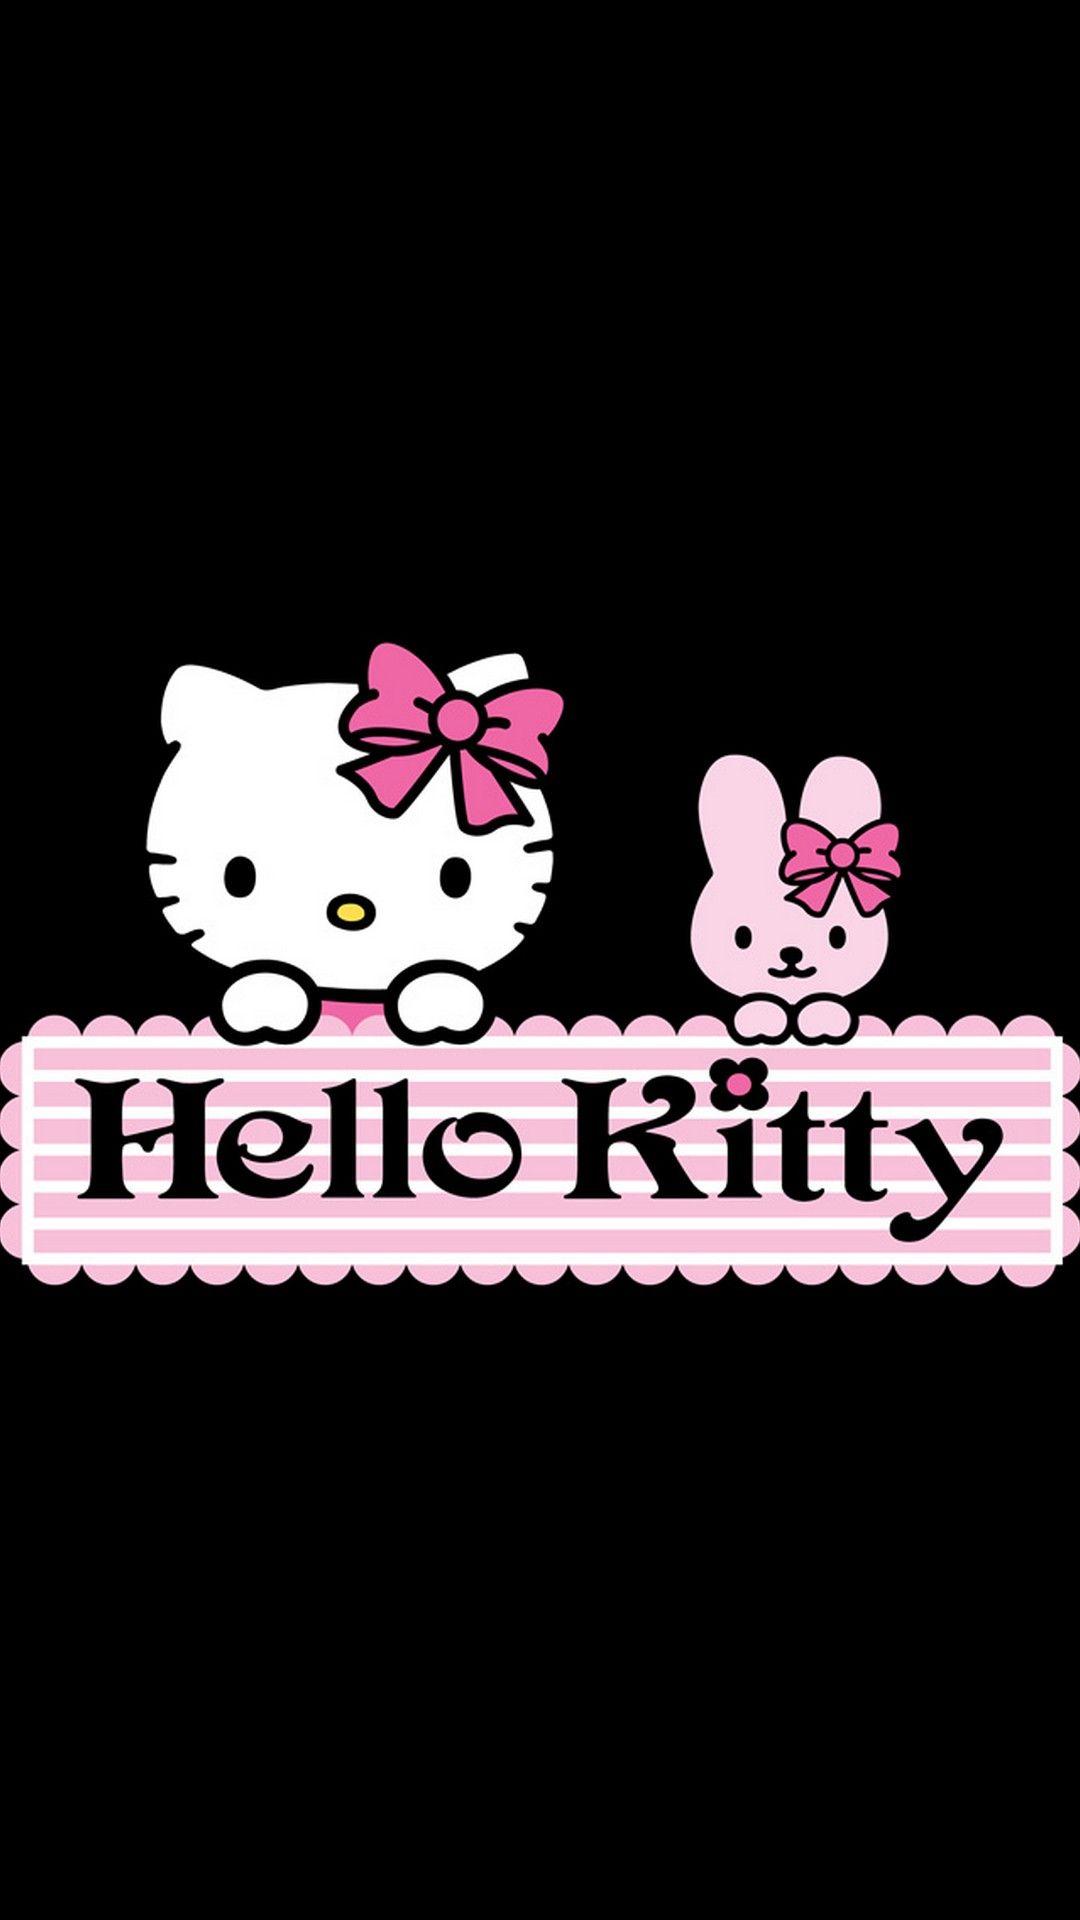 Kitty Iphone 6 Wallpaper Best Wallpaper Hd Hello Kitty Hello Kitty Backgrounds Hello Kitty Cartoon